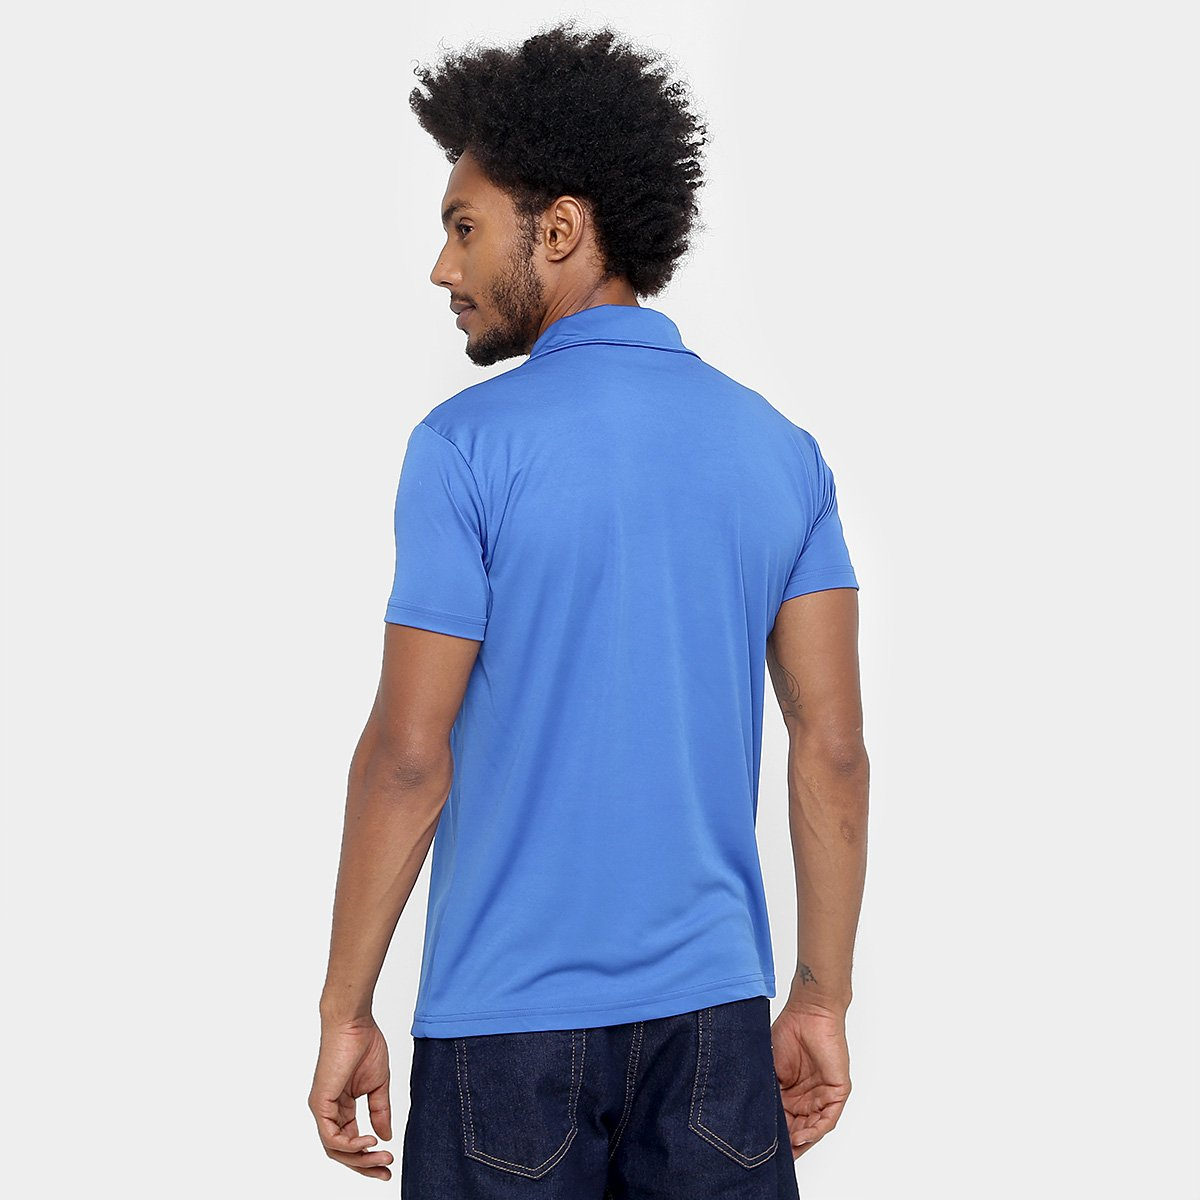 Camisa Polo Cruzeiro Fox Lines Masculina - Compre Agora  dd75a55581f83